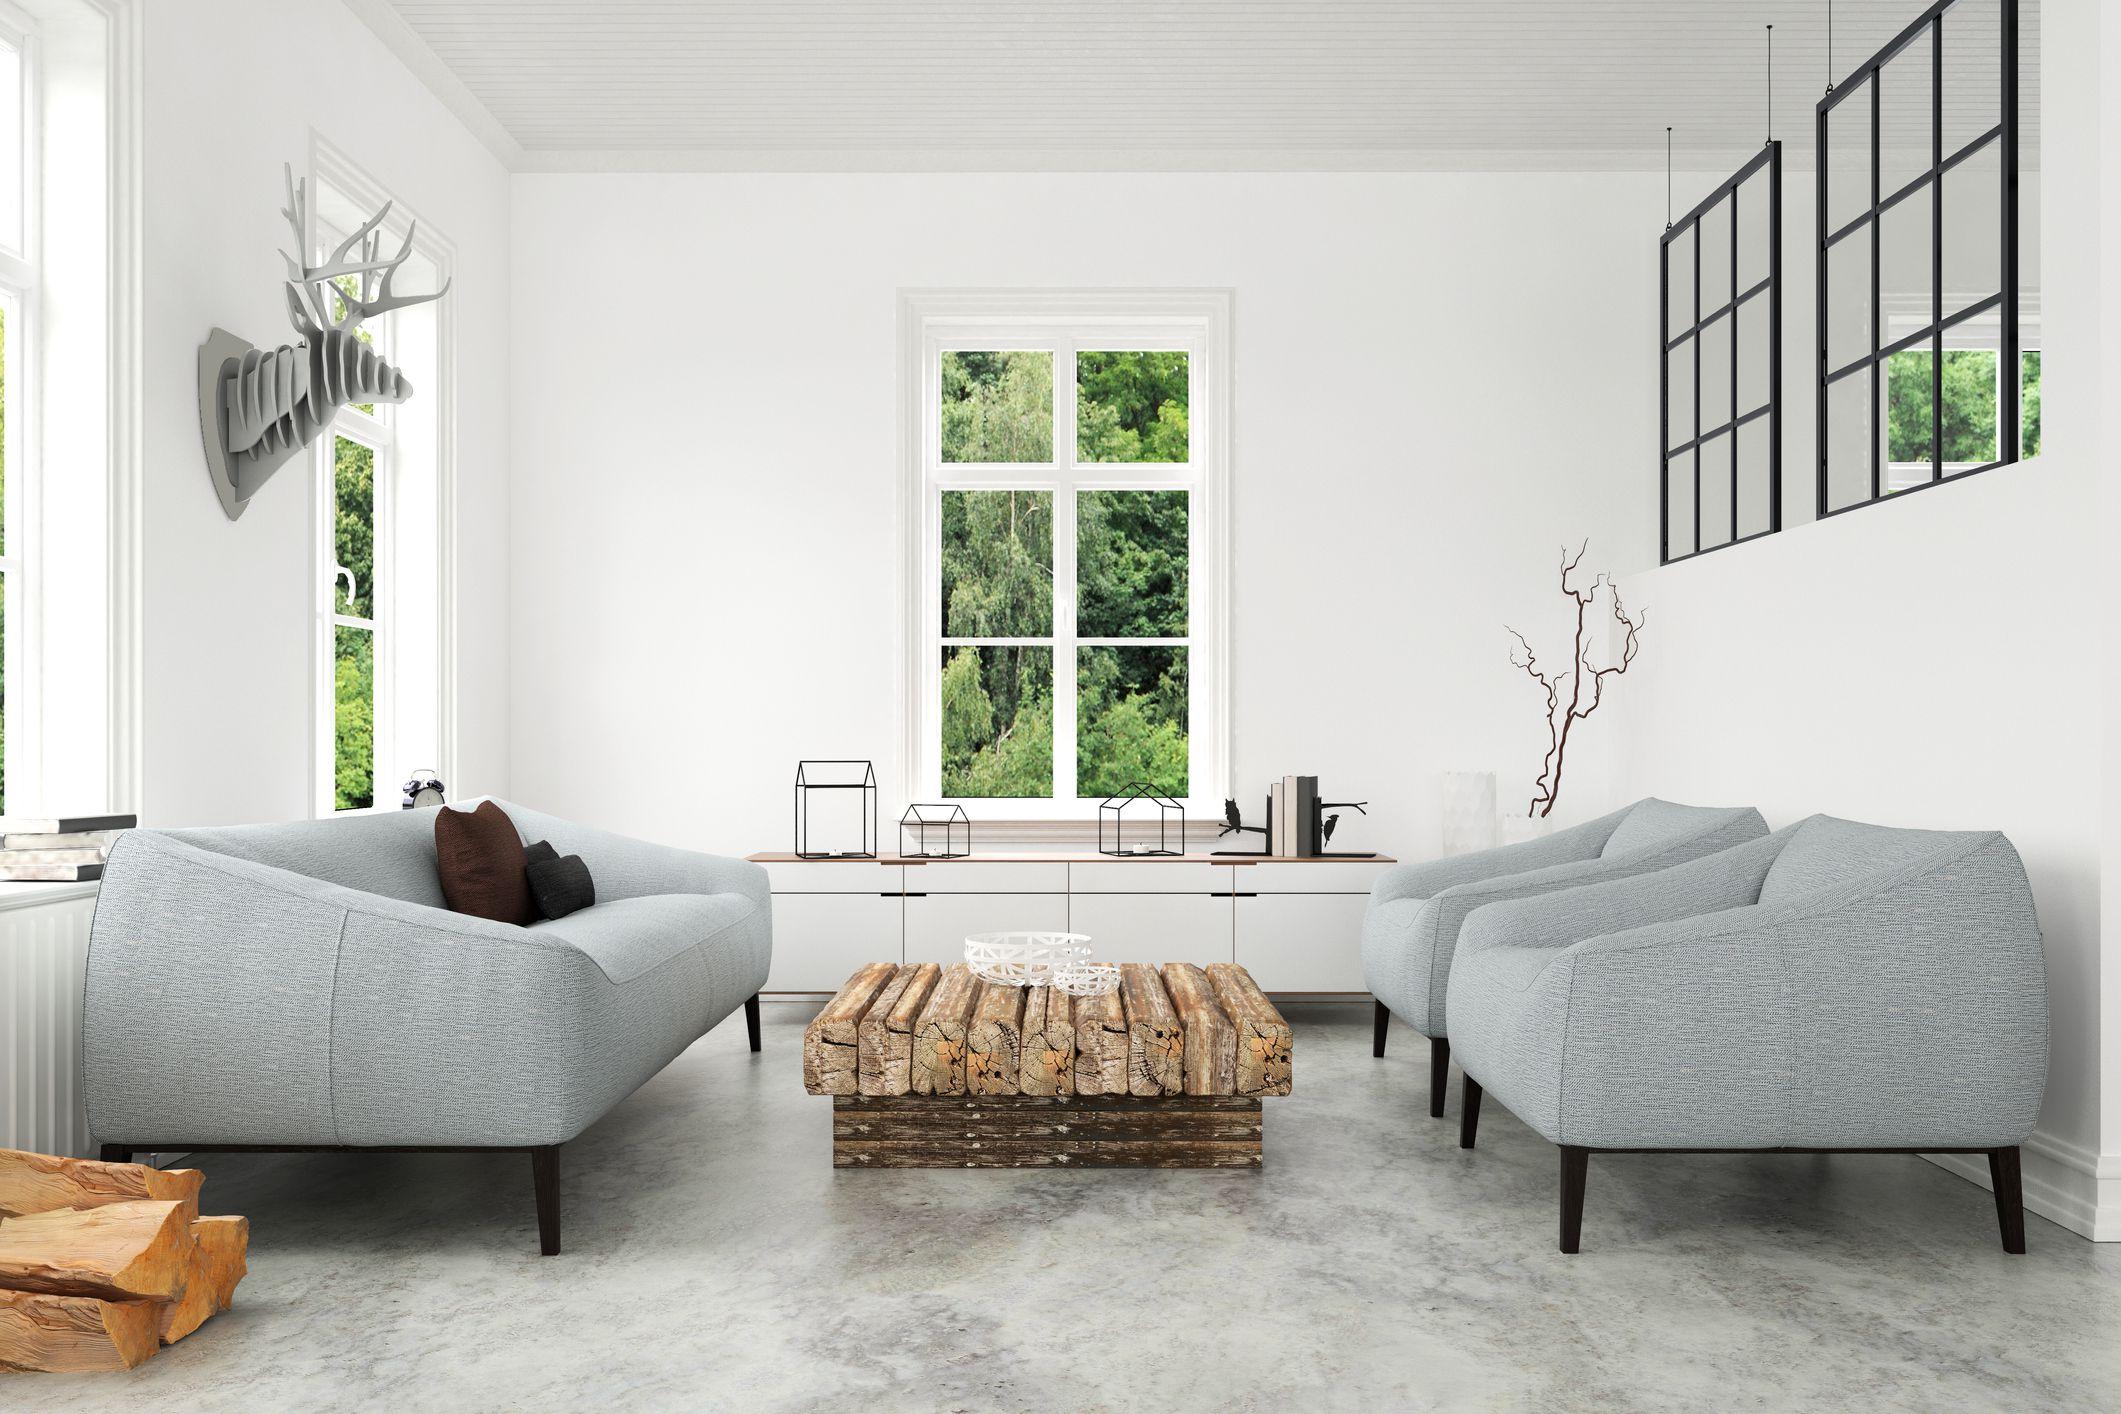 11 Creative Treatments for Concrete Floors